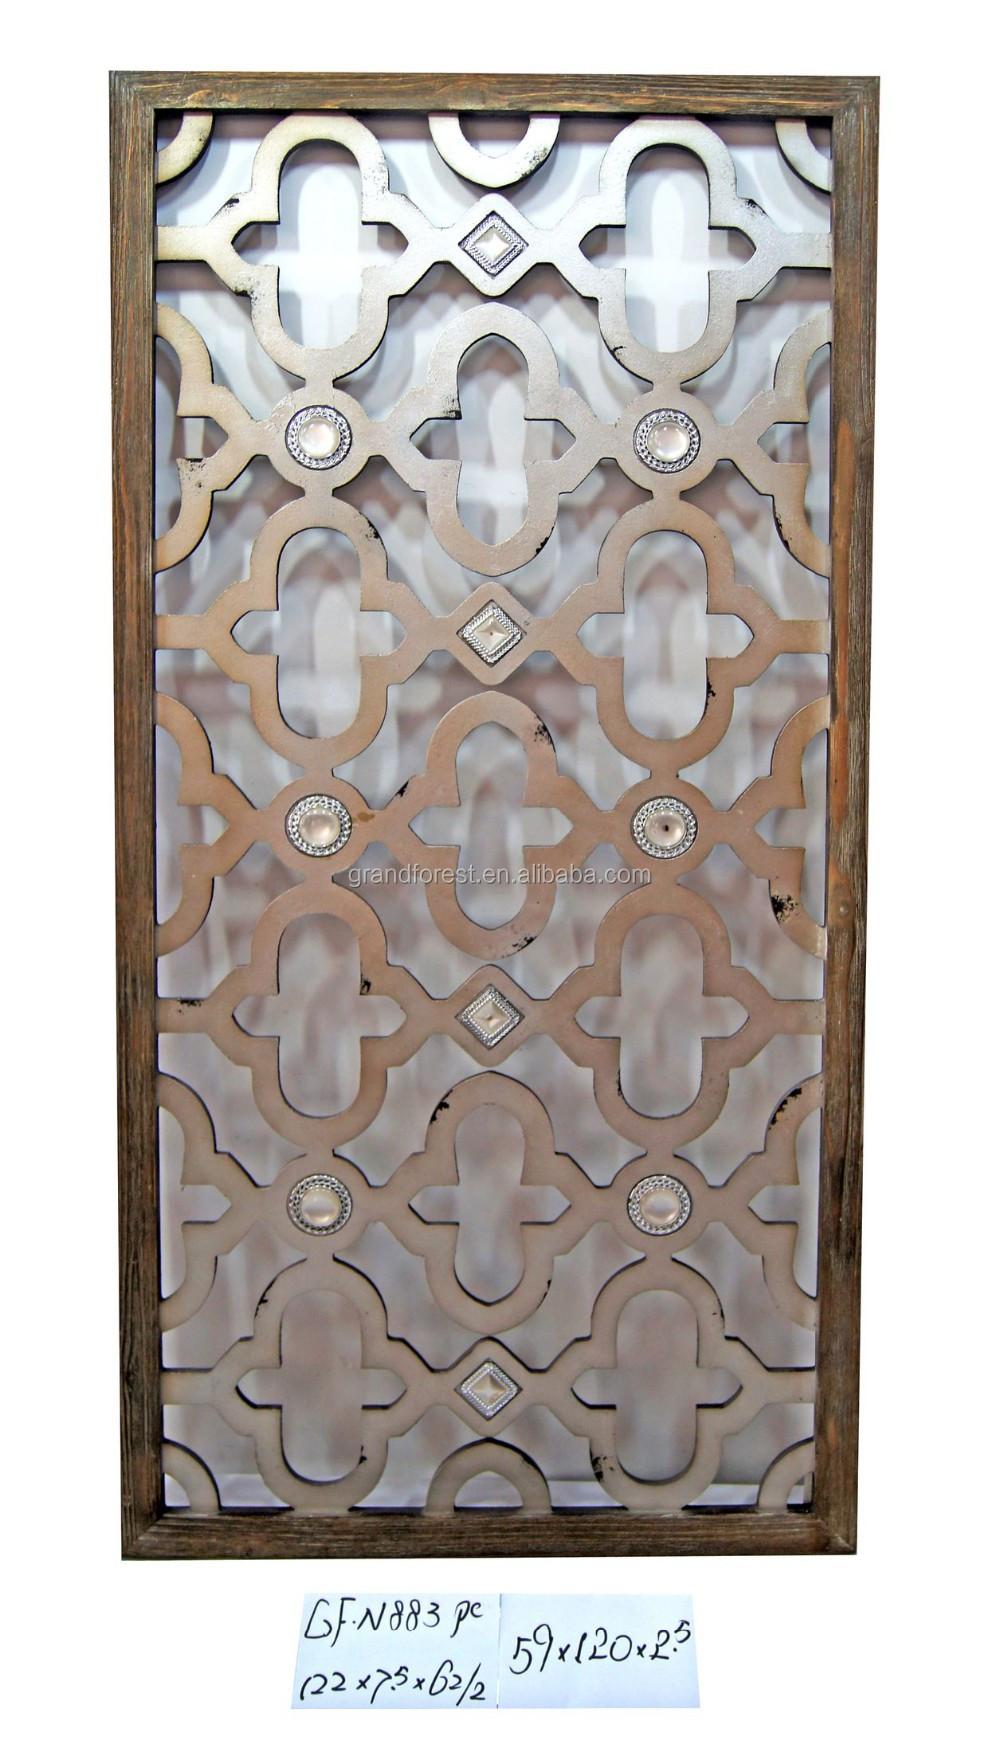 Large rectange decorative mirror wall buy mirror wall for Affordable decorative mirrors